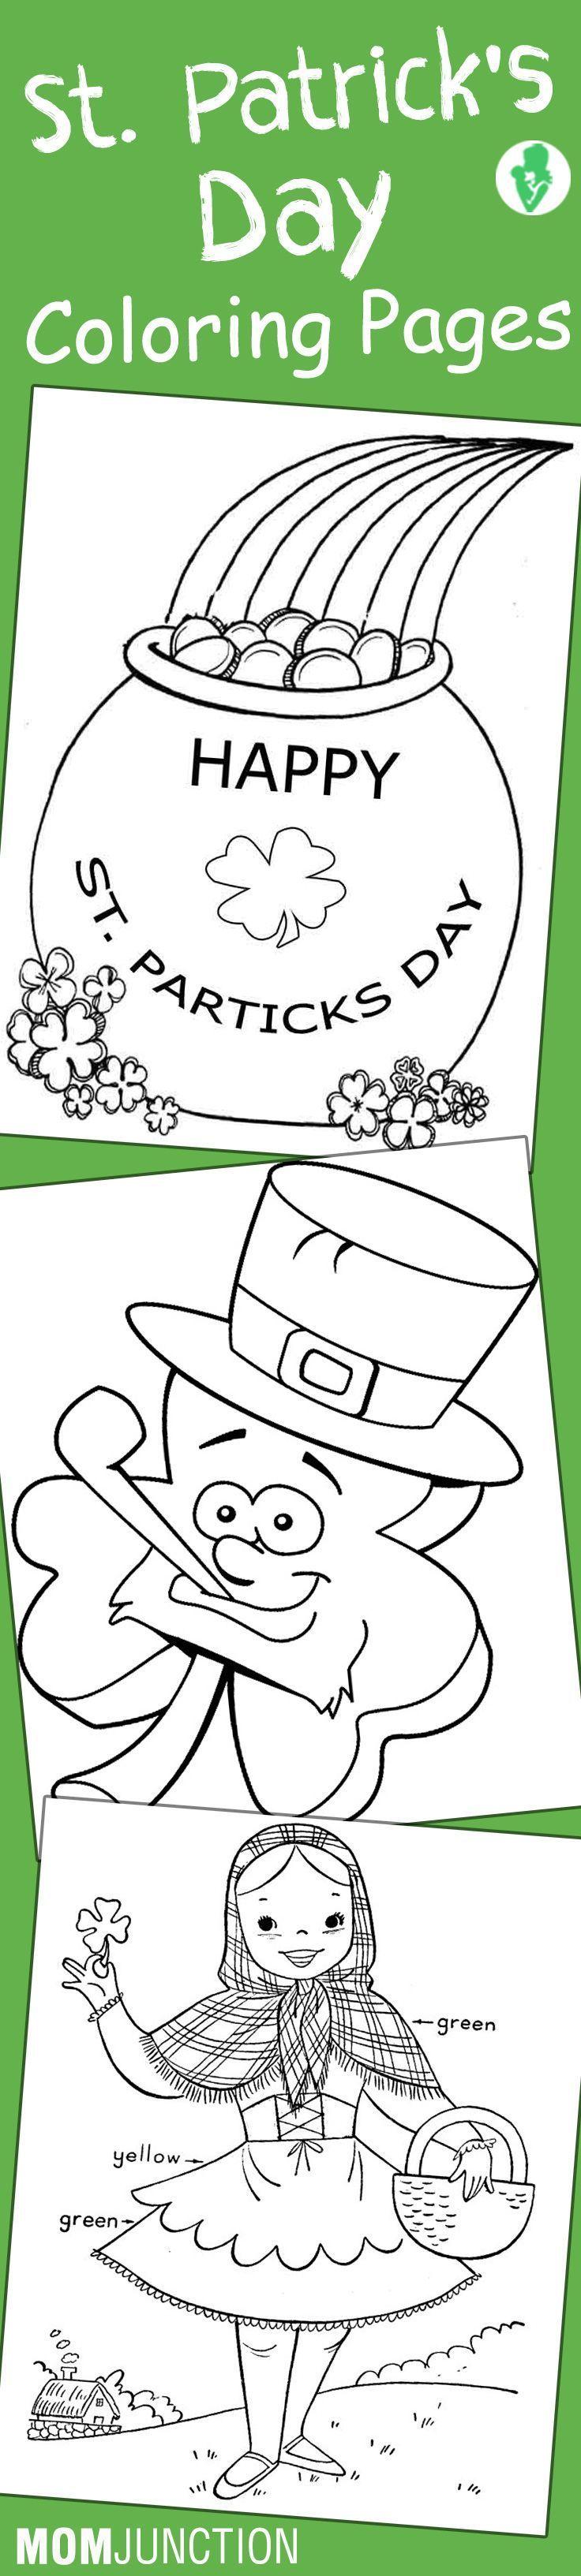 10 Best St Patrick S Day